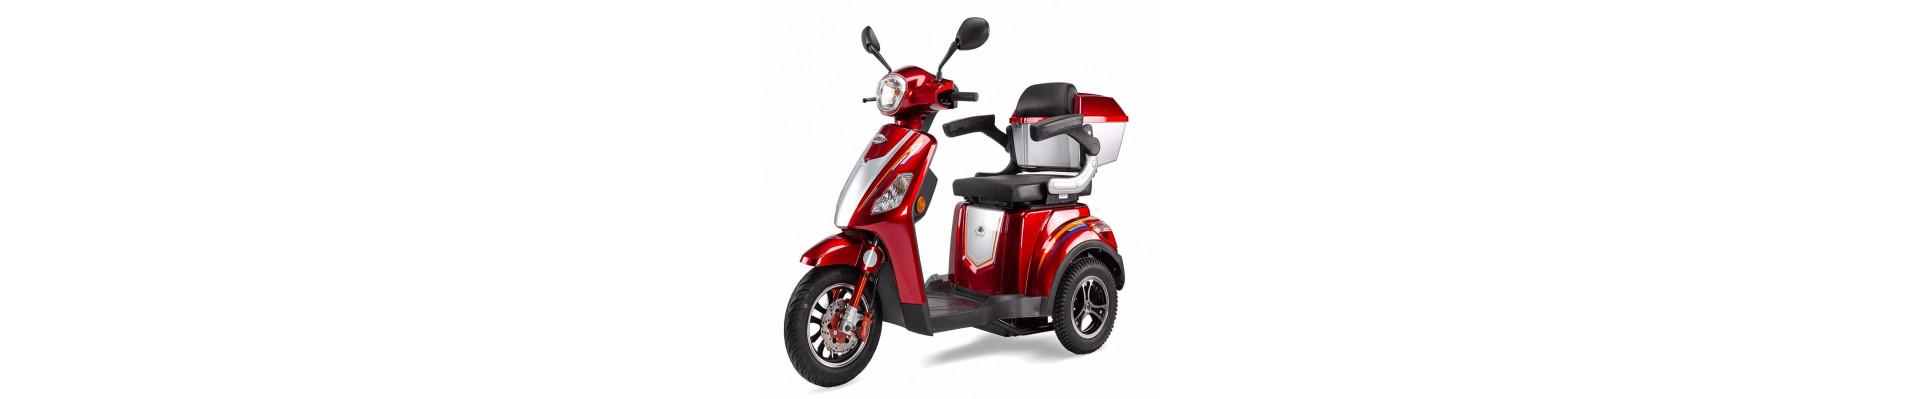 Elscooter    Promenadscooter   Permobil